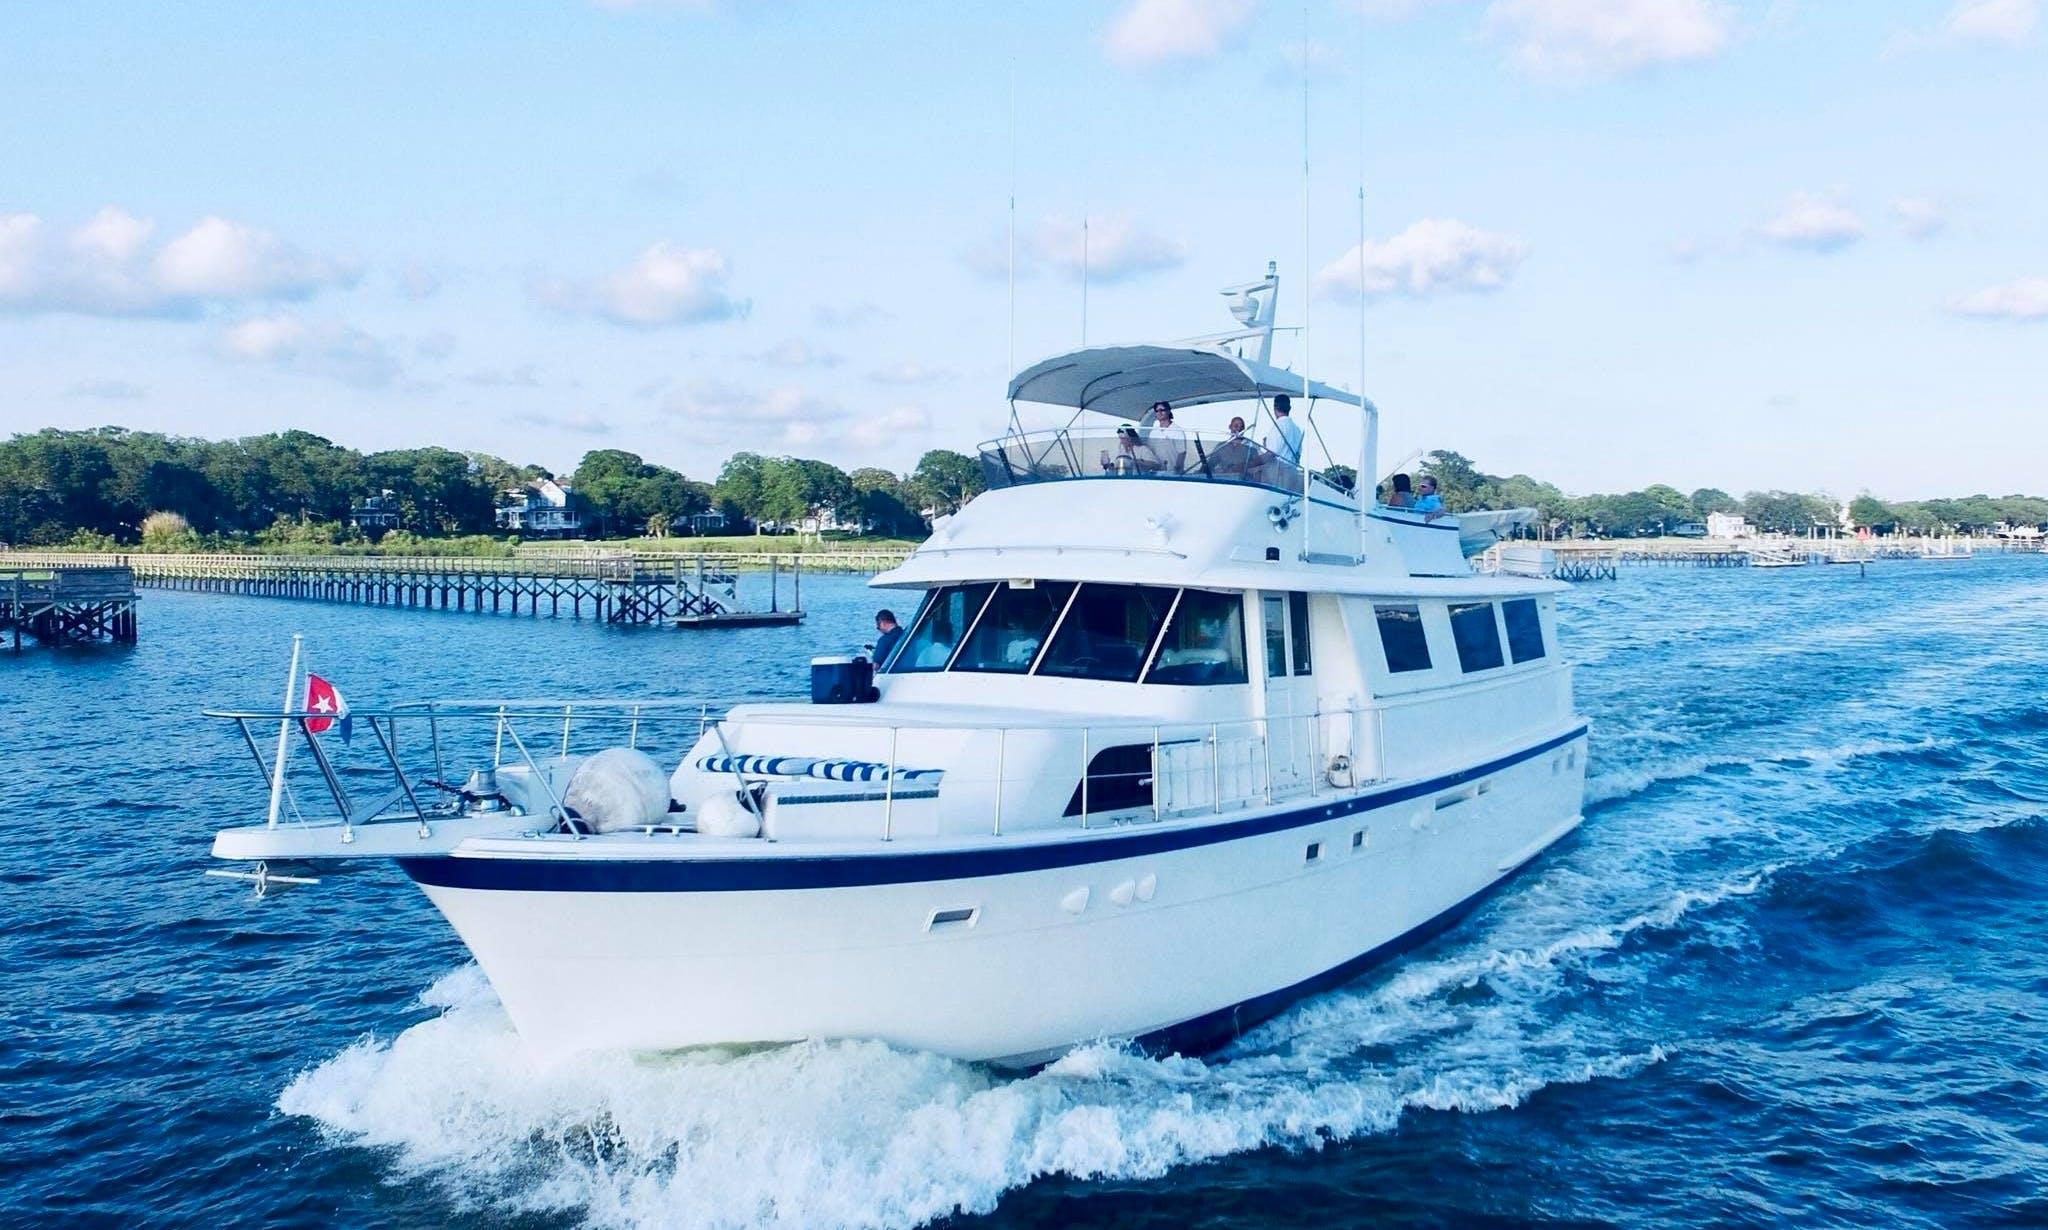 61' Hatteras Motor yacht for overnight rental